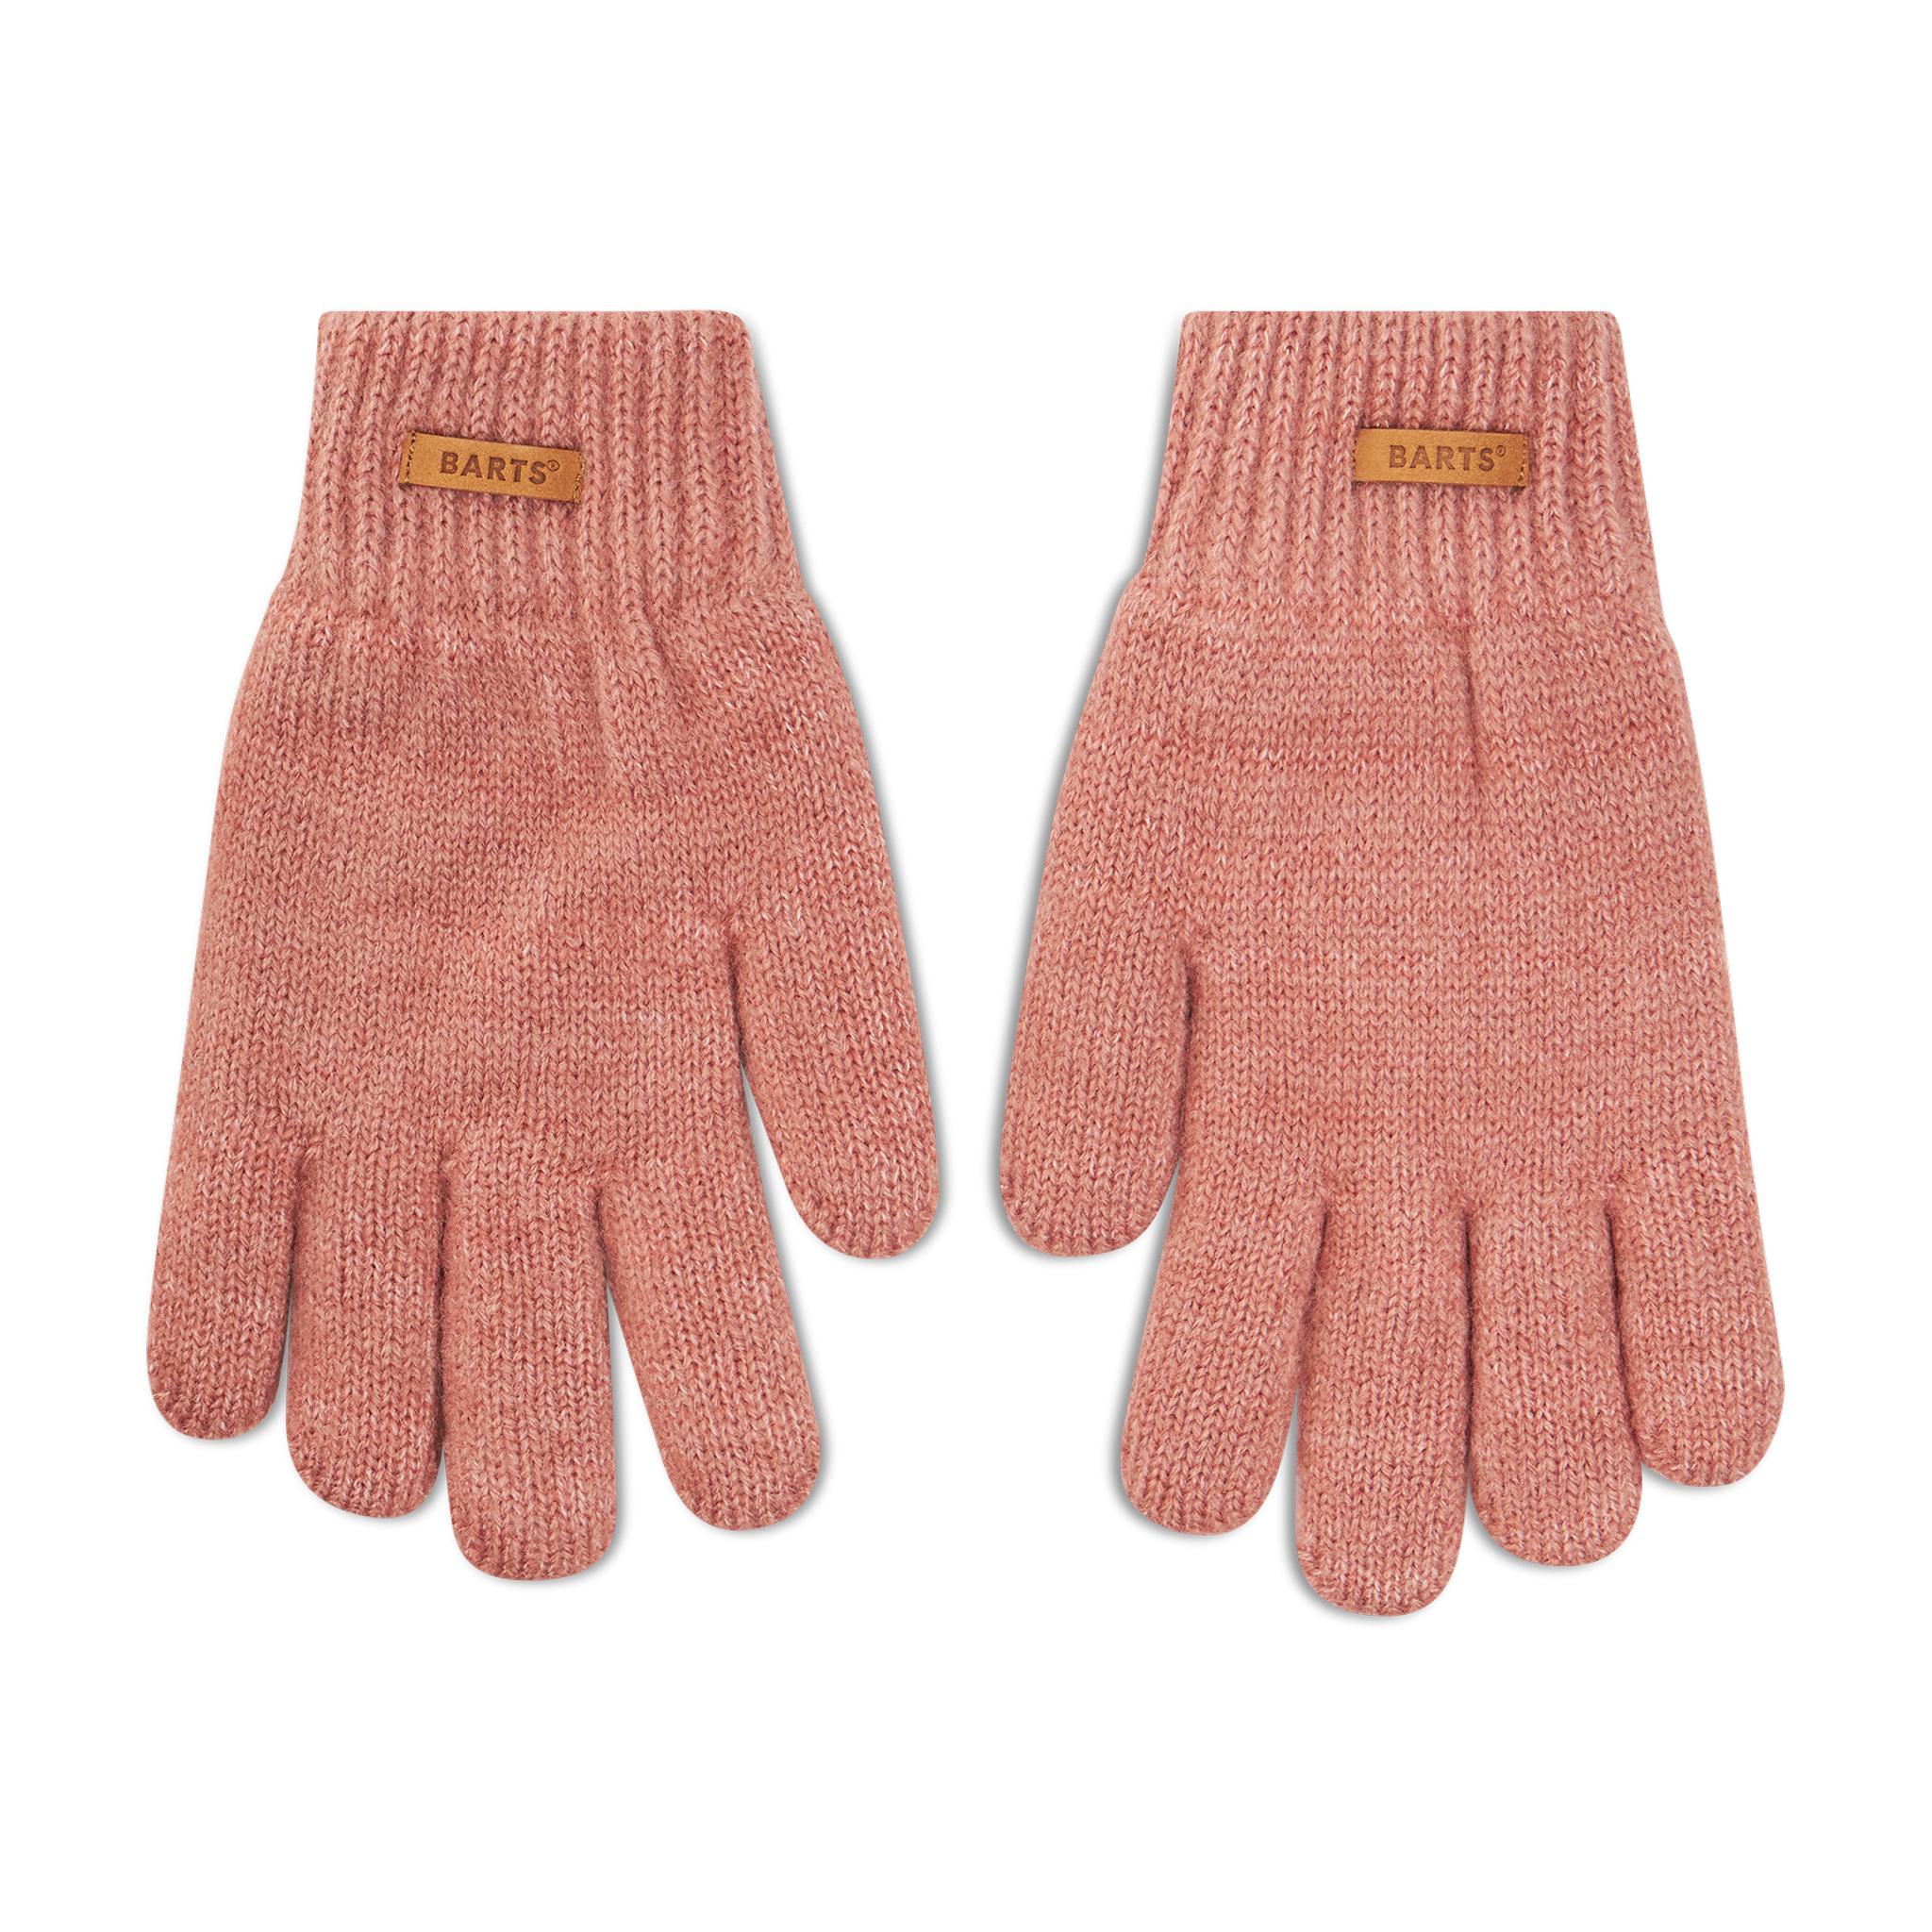 Image of Damenhandschuhe BARTS - Rozamond Gloves 4622308 Morganite